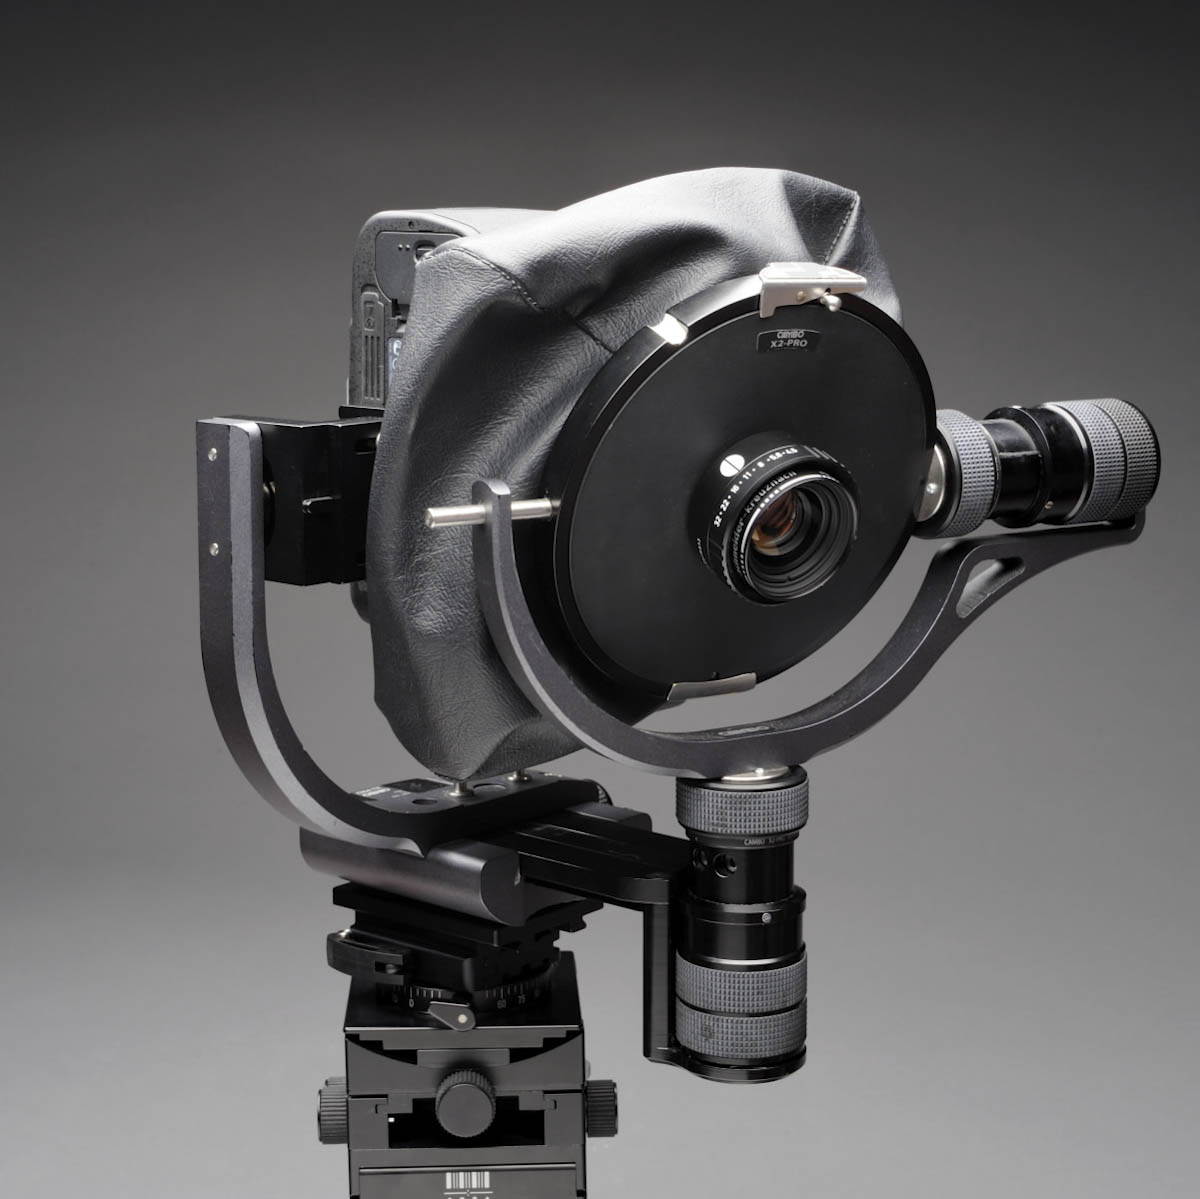 Nikon-D800-Cambo-X2-Pro-Schneider-Kreuznach-APO-90mm-f4.5-11